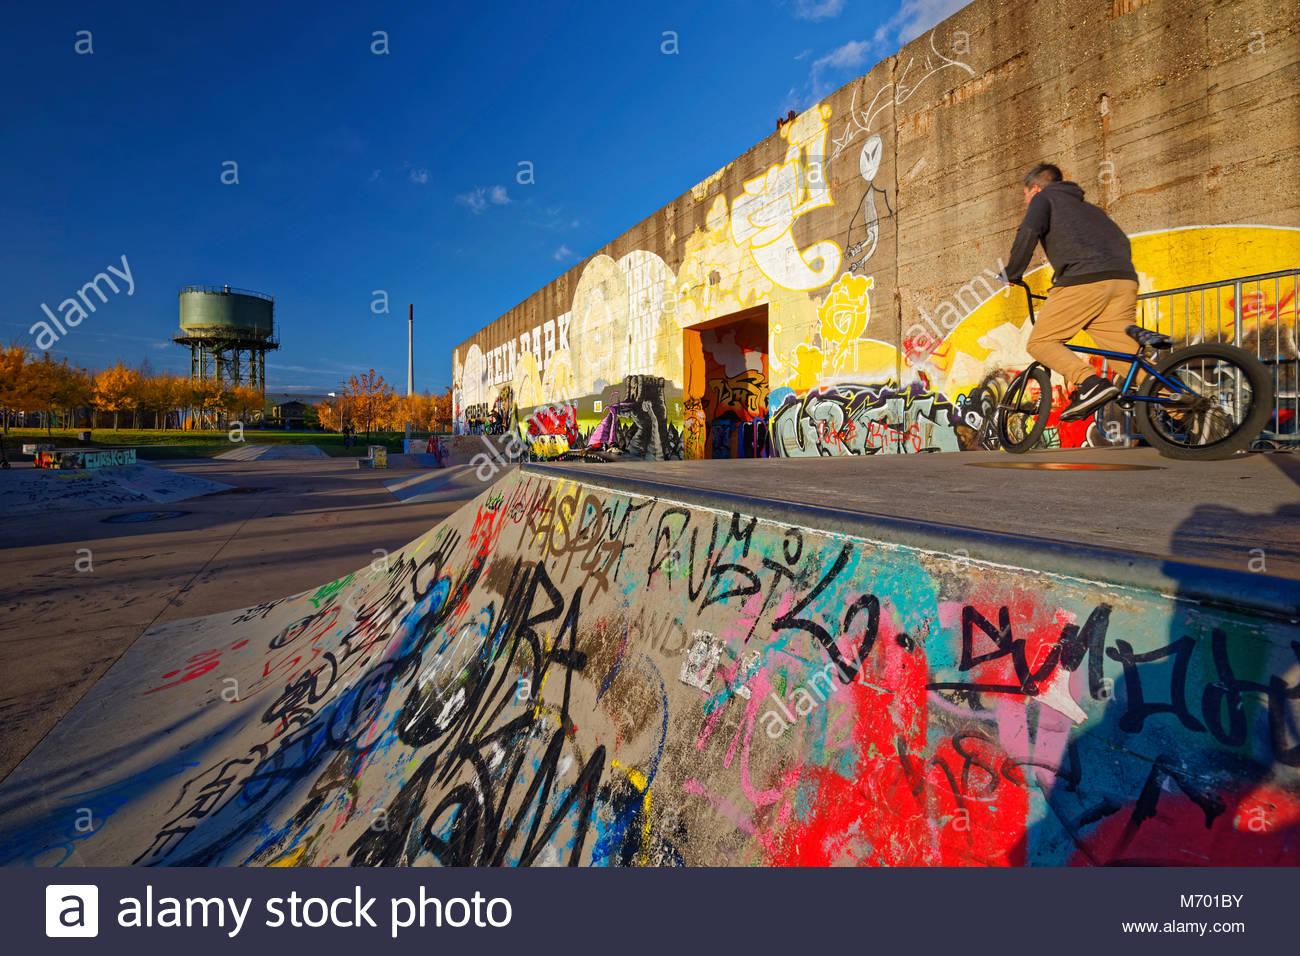 skatepark BMX-rider on funbox sport concrete wall graffiti colourful colour mural Rheinpark Duisburg-Hochfeld North - Stock Image